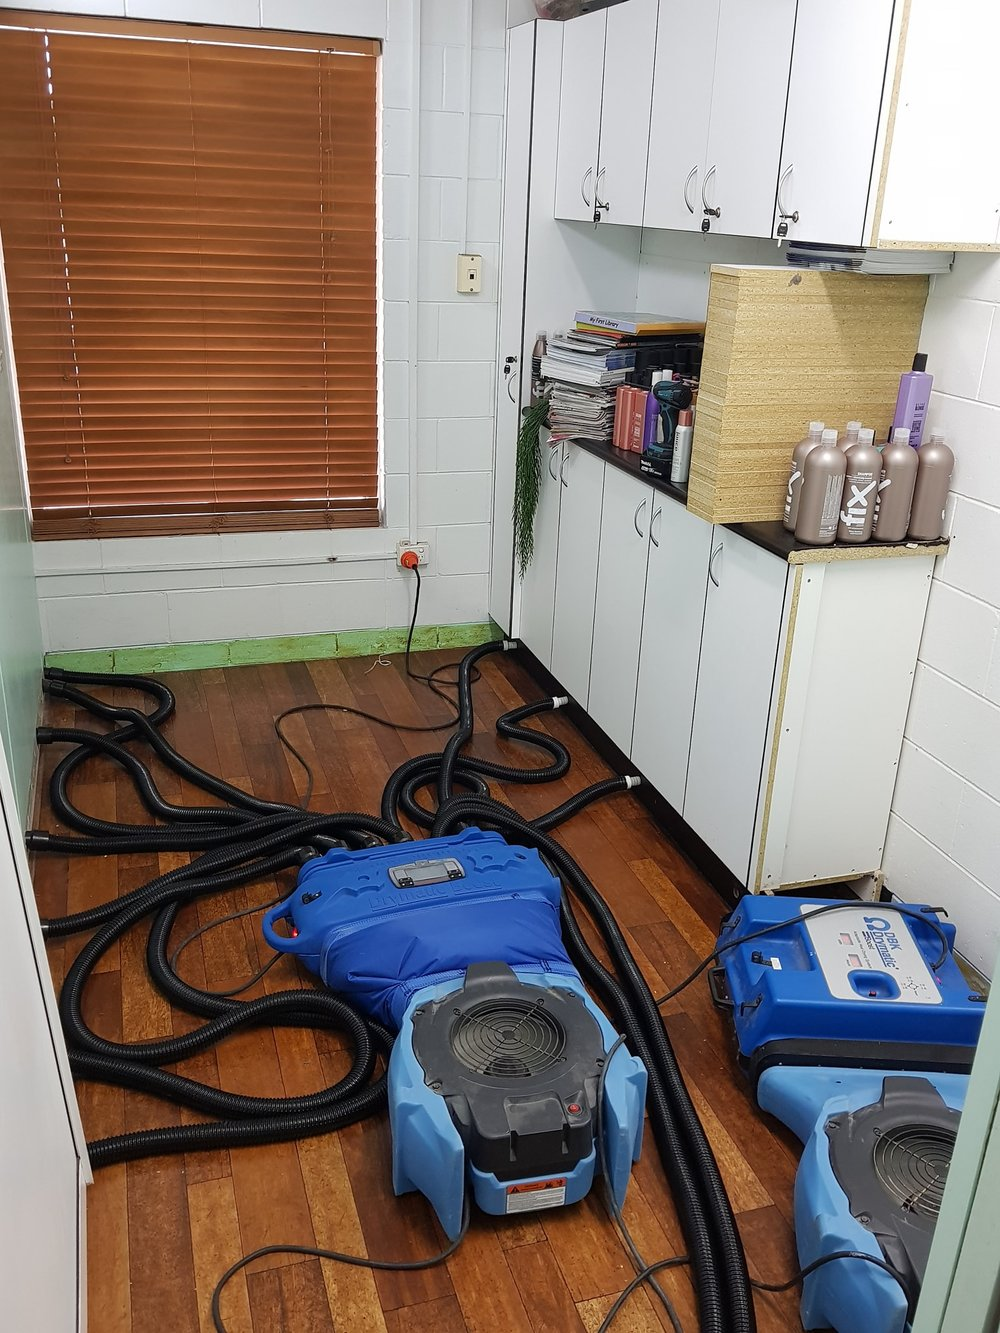 drying a hair salon, Hayden Bethel, Drymatic Australia 1.jpg